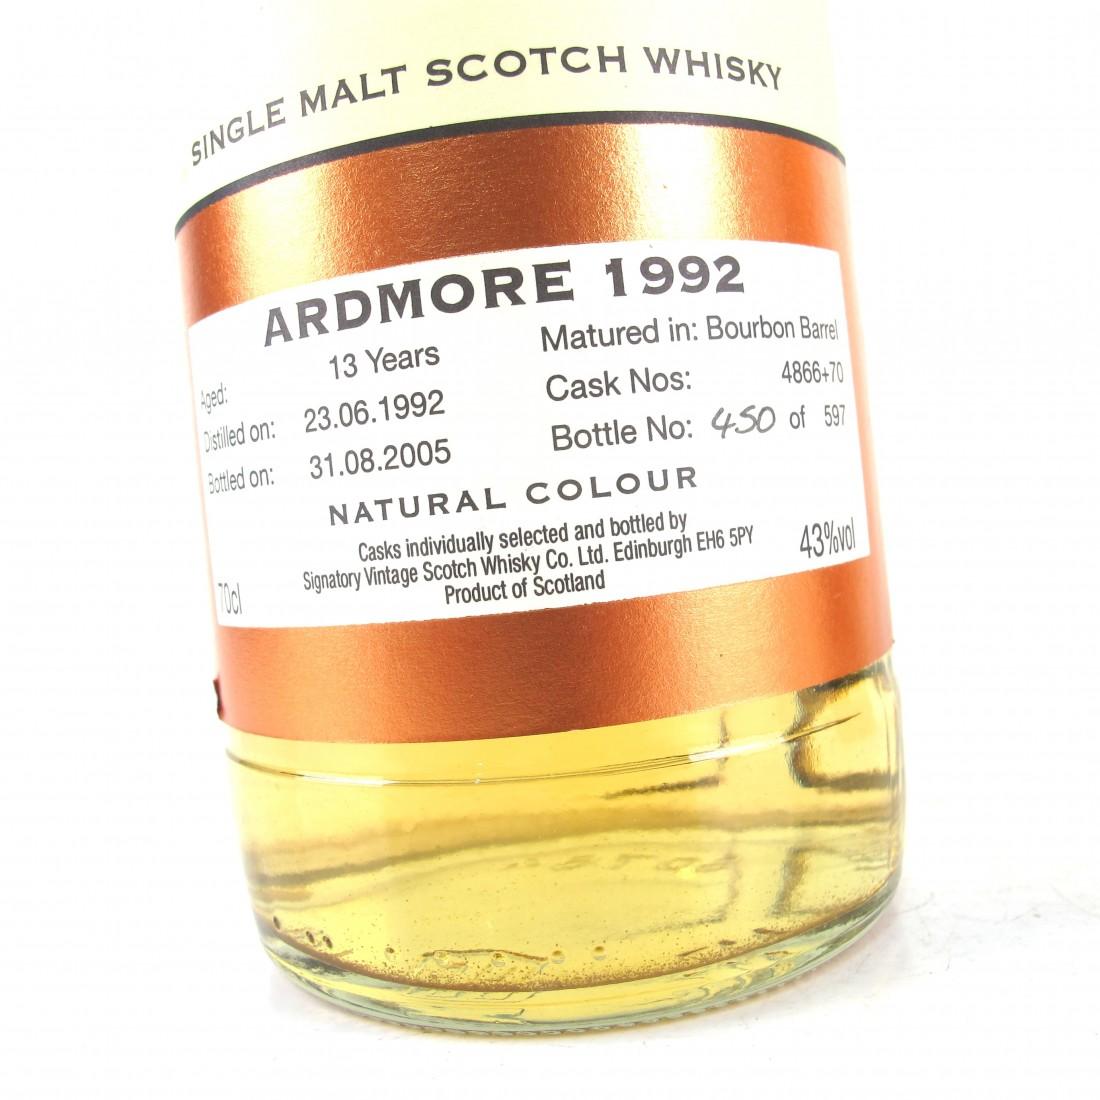 Ardmore 1992 Signatory Vintage 13 Year Old